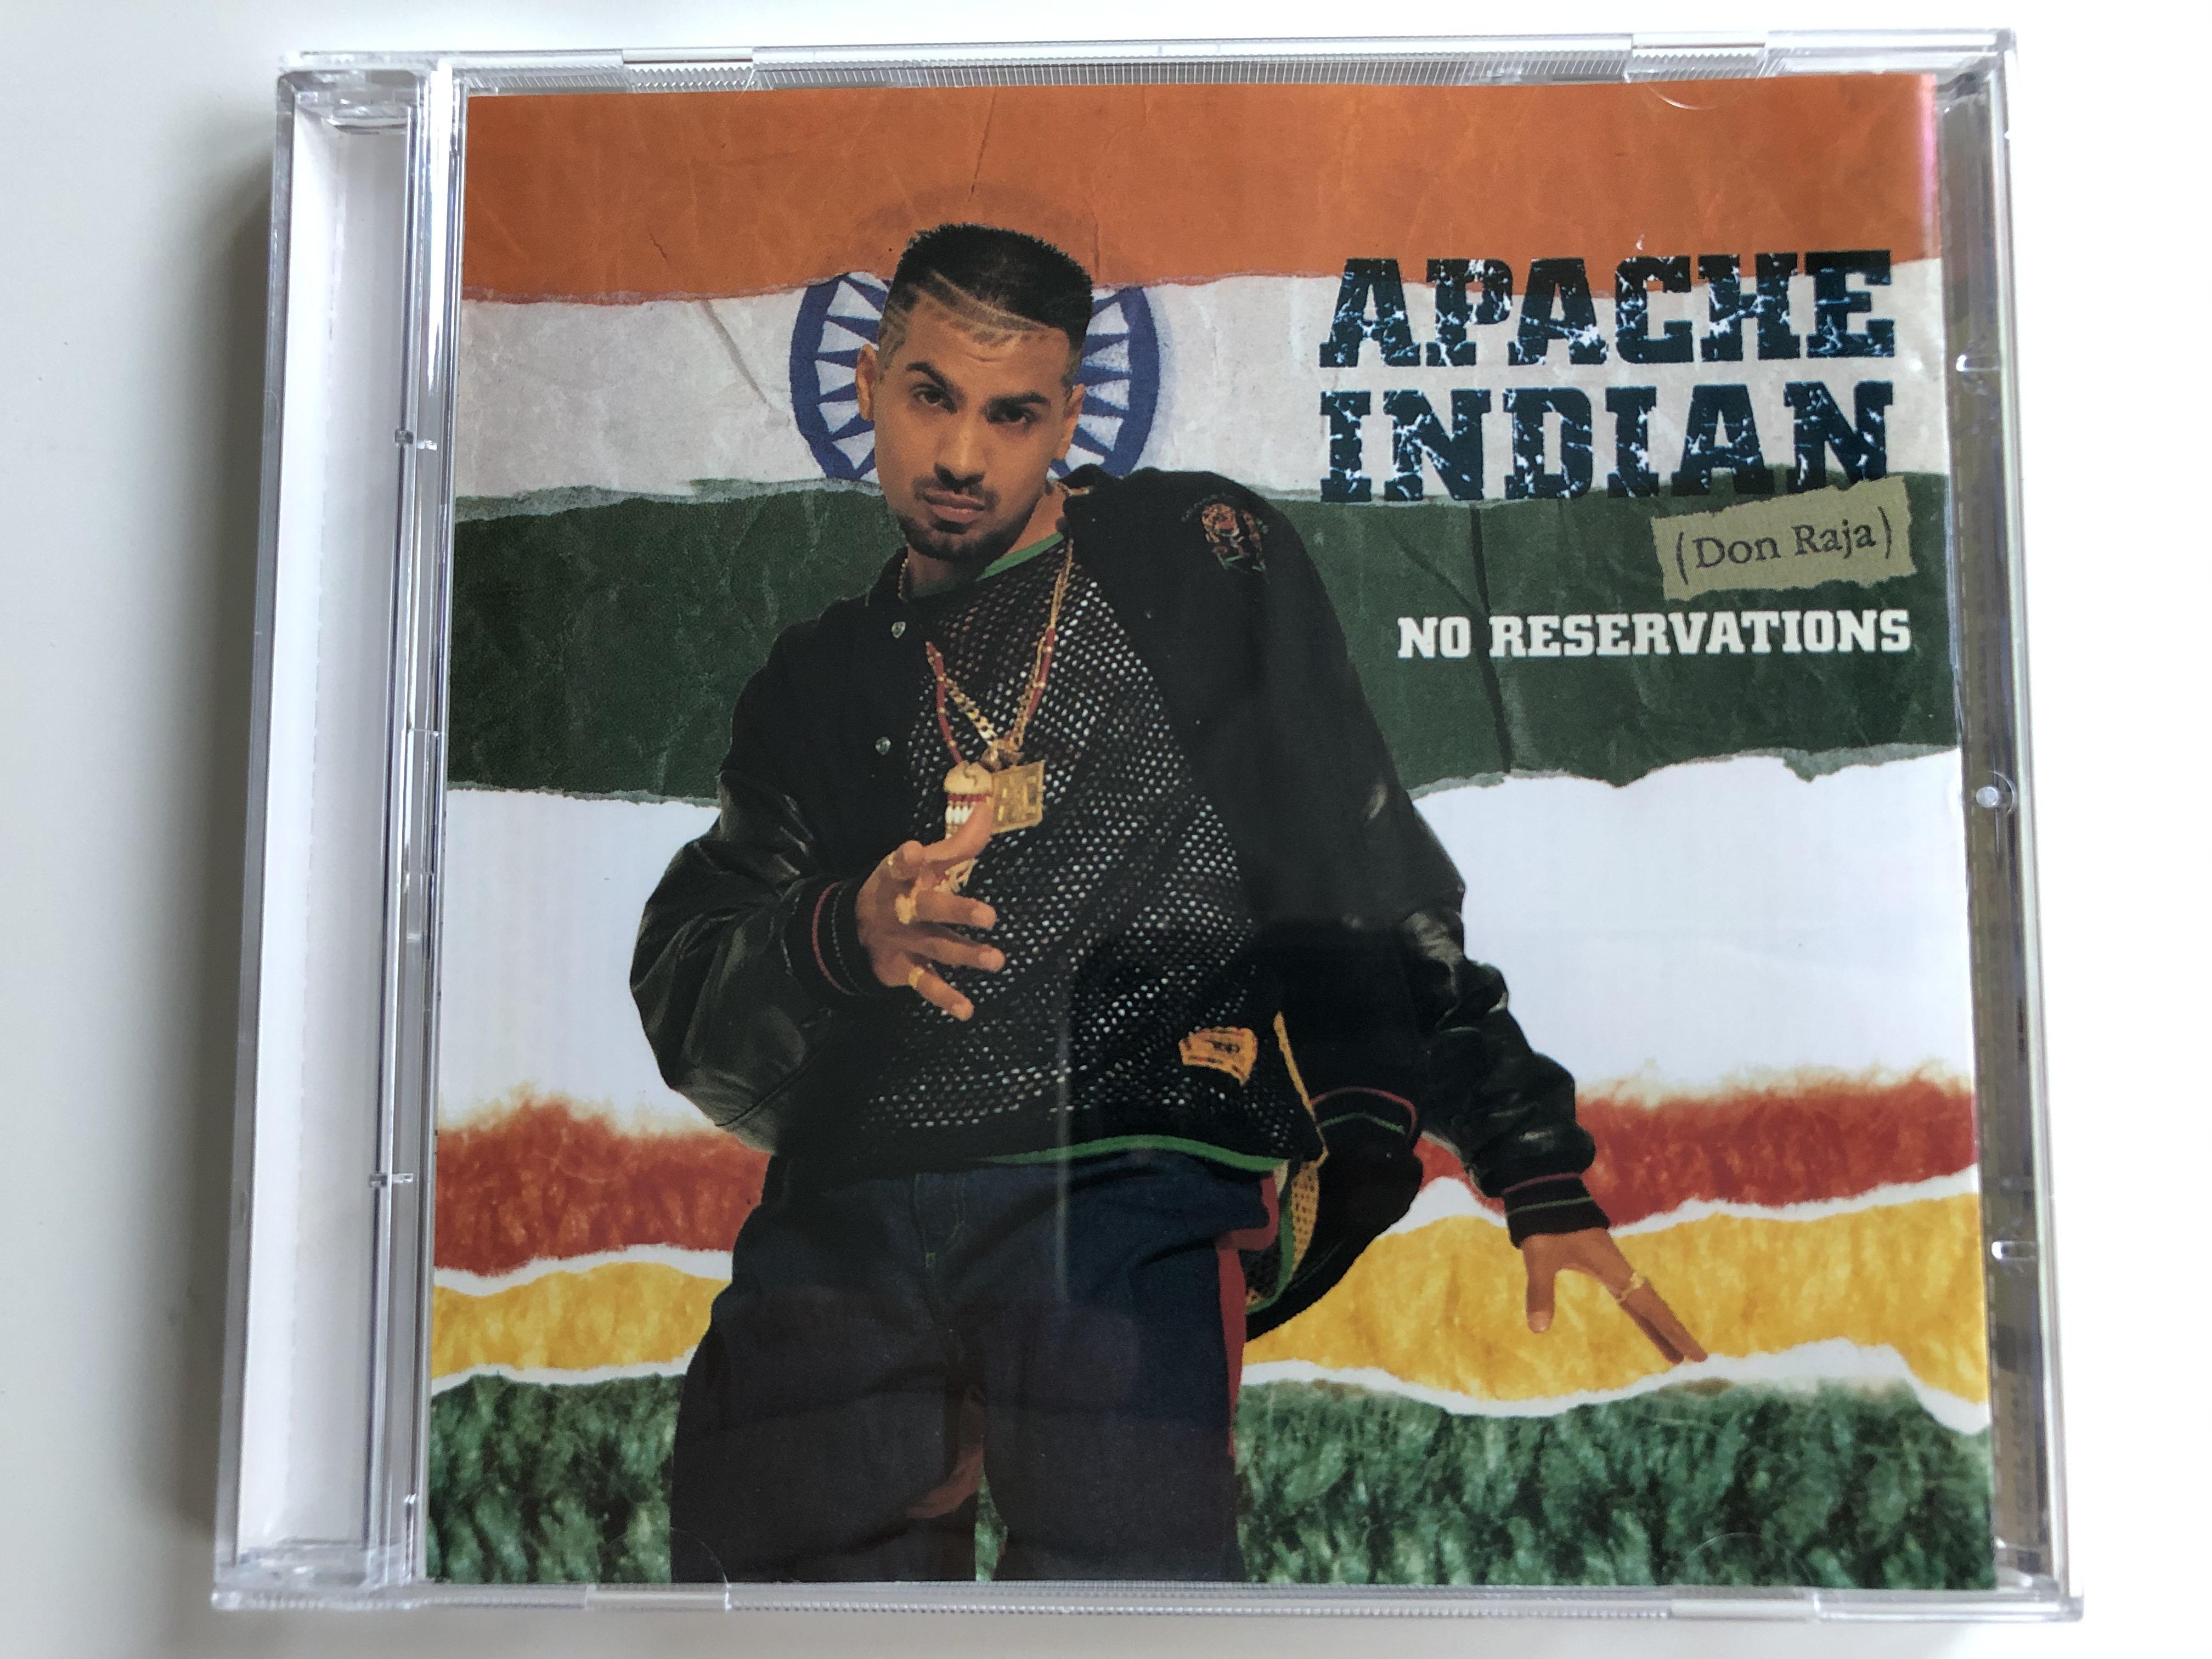 apache-indian-don-raja-no-reservations-island-records-audio-cd-1993-74321-12632-2-1-.jpg